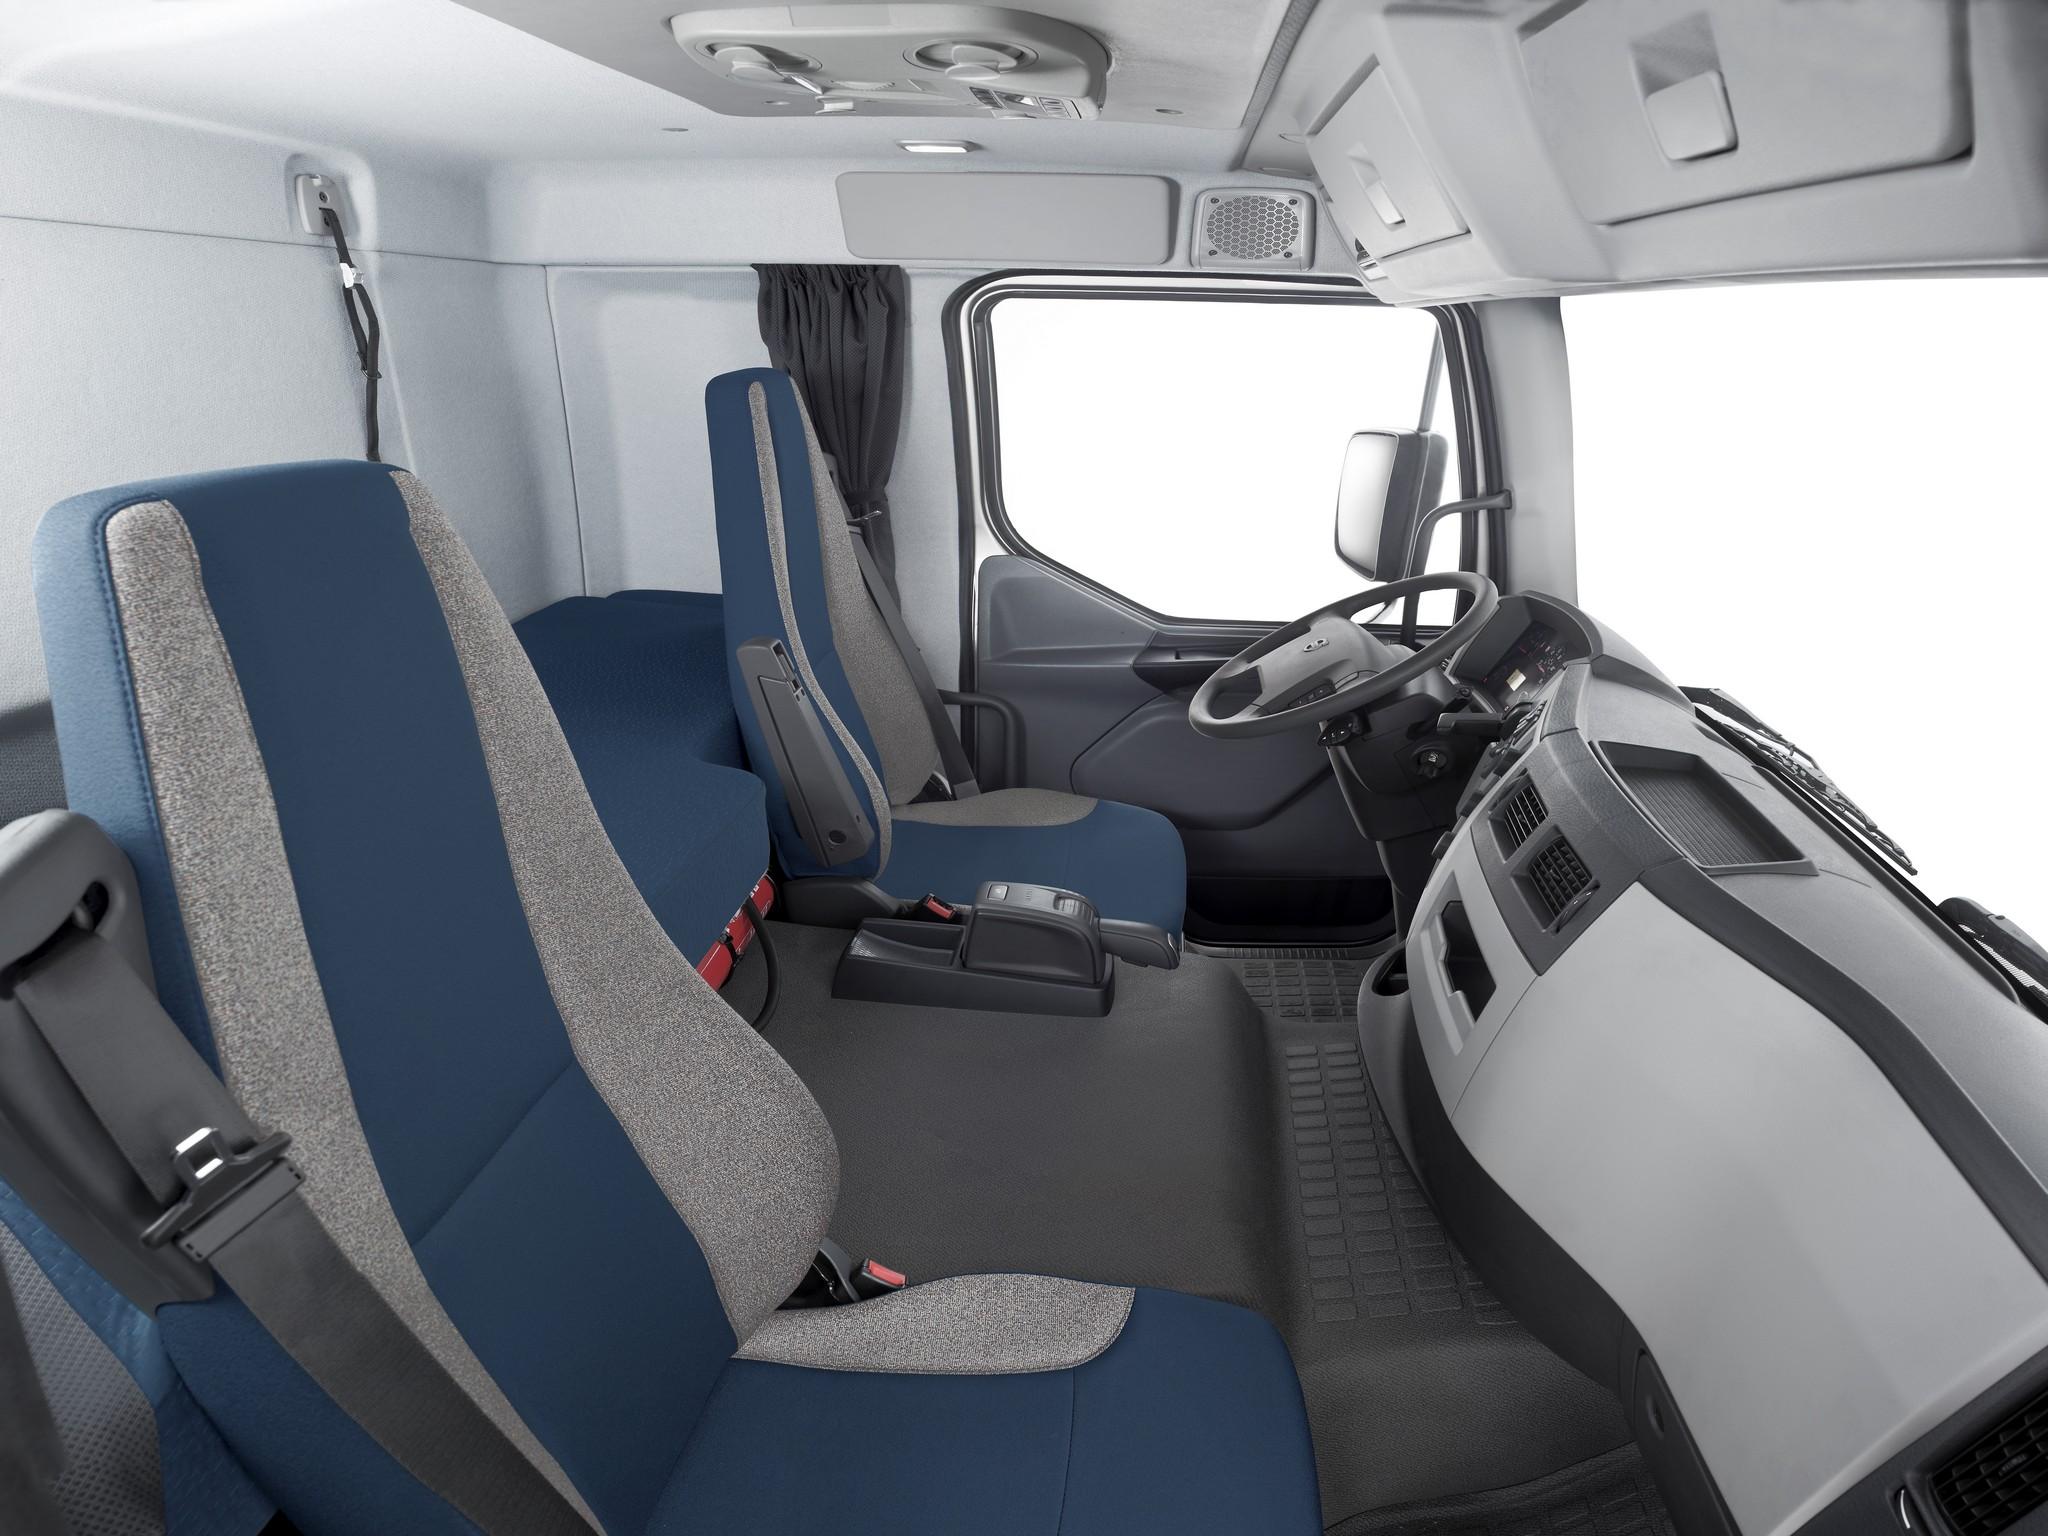 Volvo Truck Inside Volvo Trucks 2014 Inte...